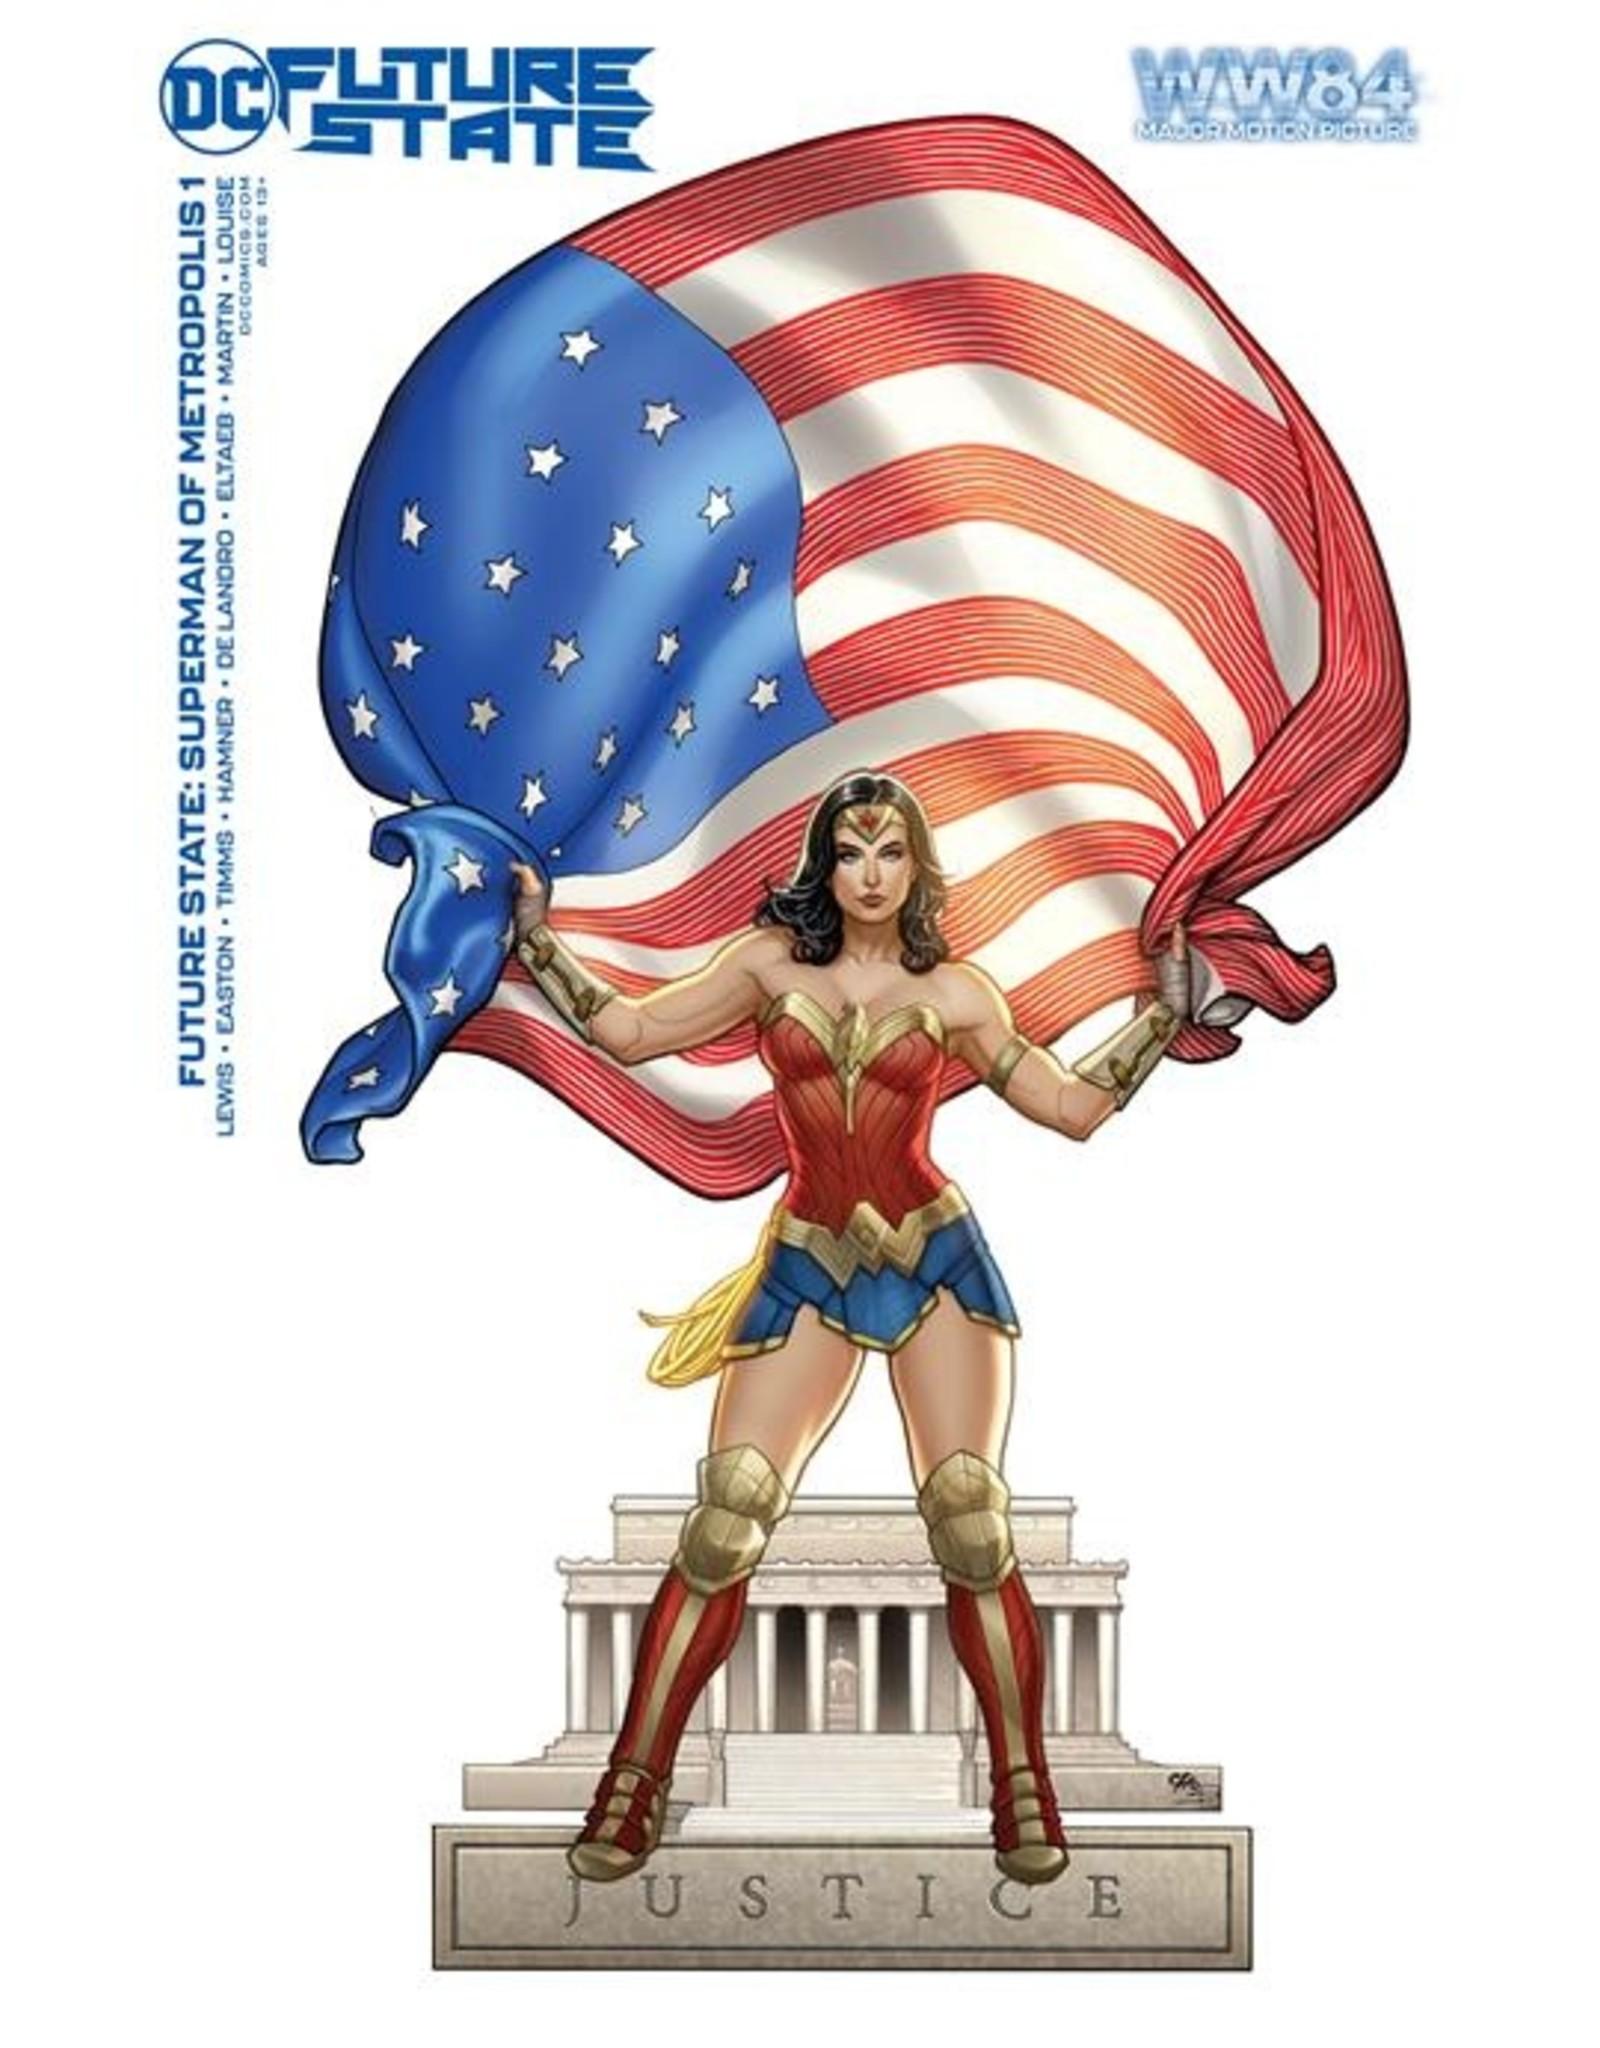 DC COMICS FUTURE STATE SUPERMAN OF METROPOLIS #1 (OF 2) CVR D WONDER WOMAN 1984 FRANK CHO CARD STOCK VAR